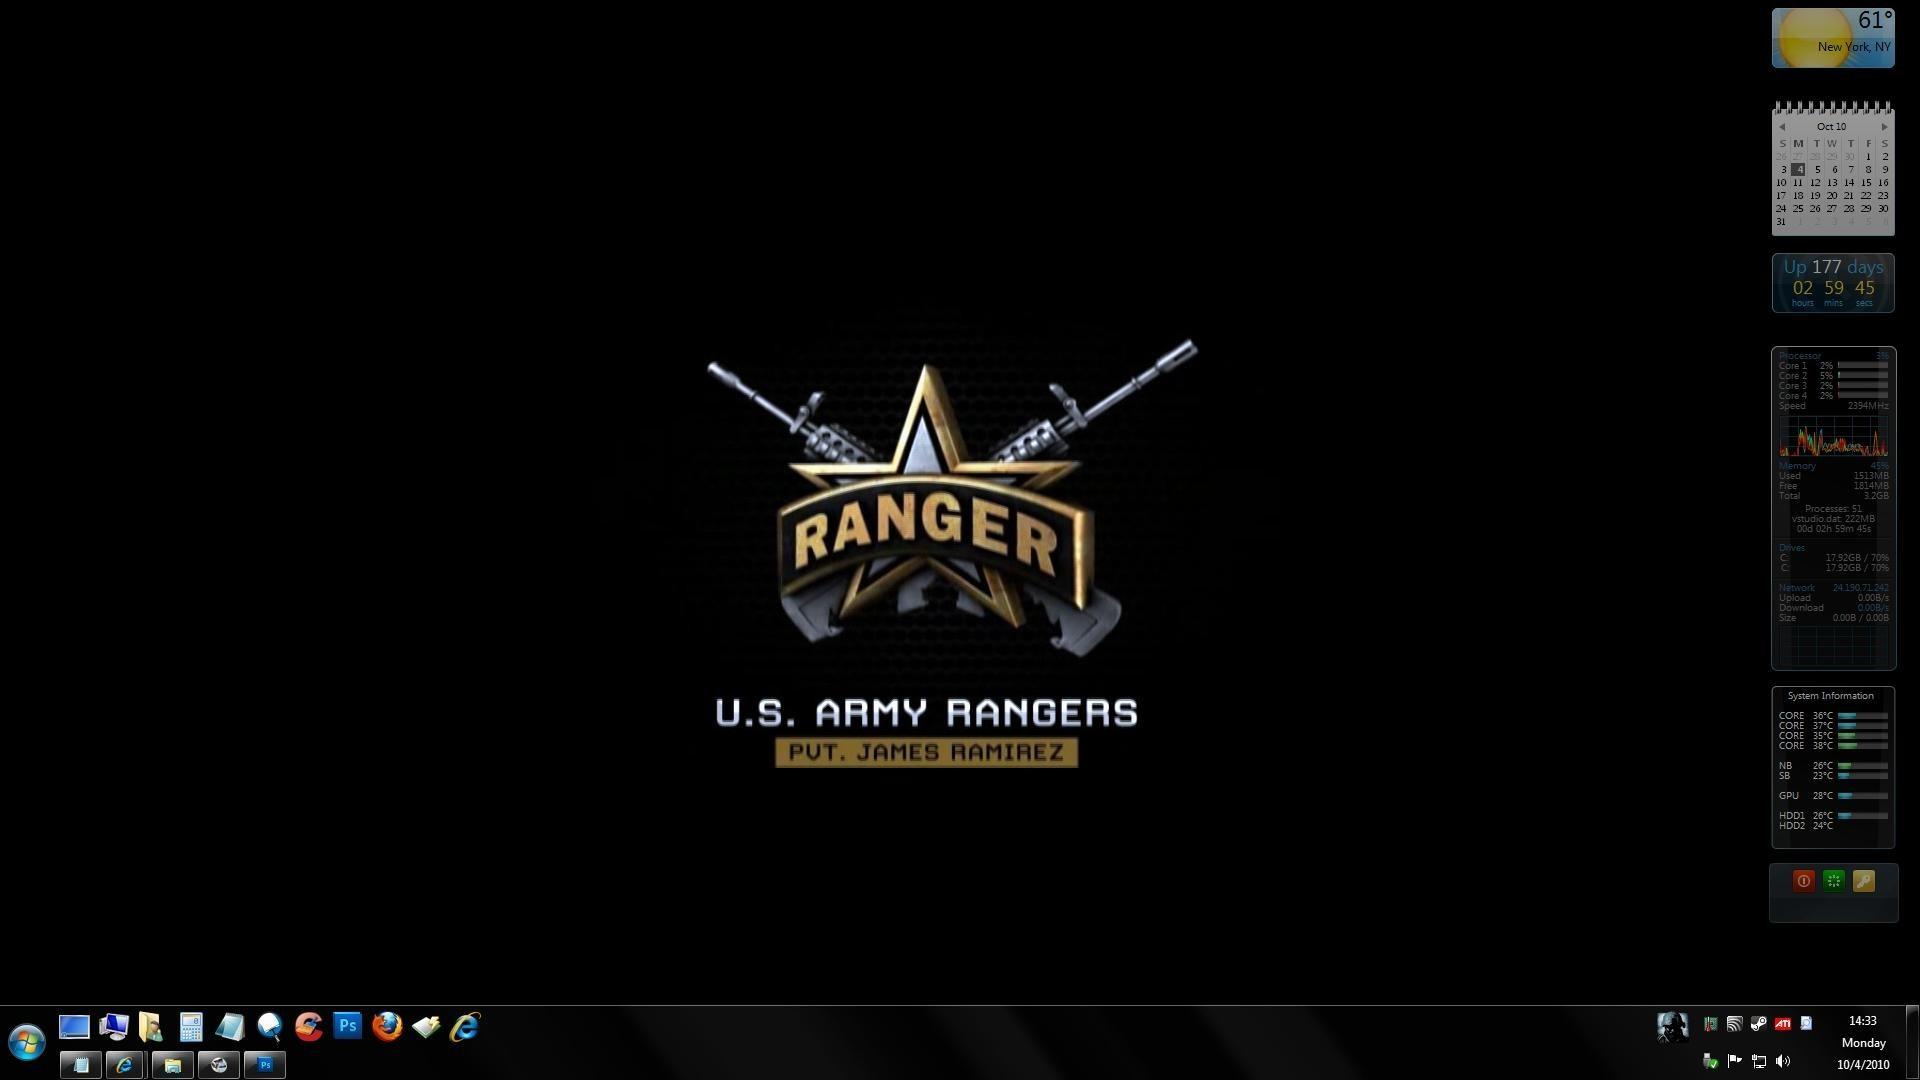 rangers logo wallpaper (71+ images)